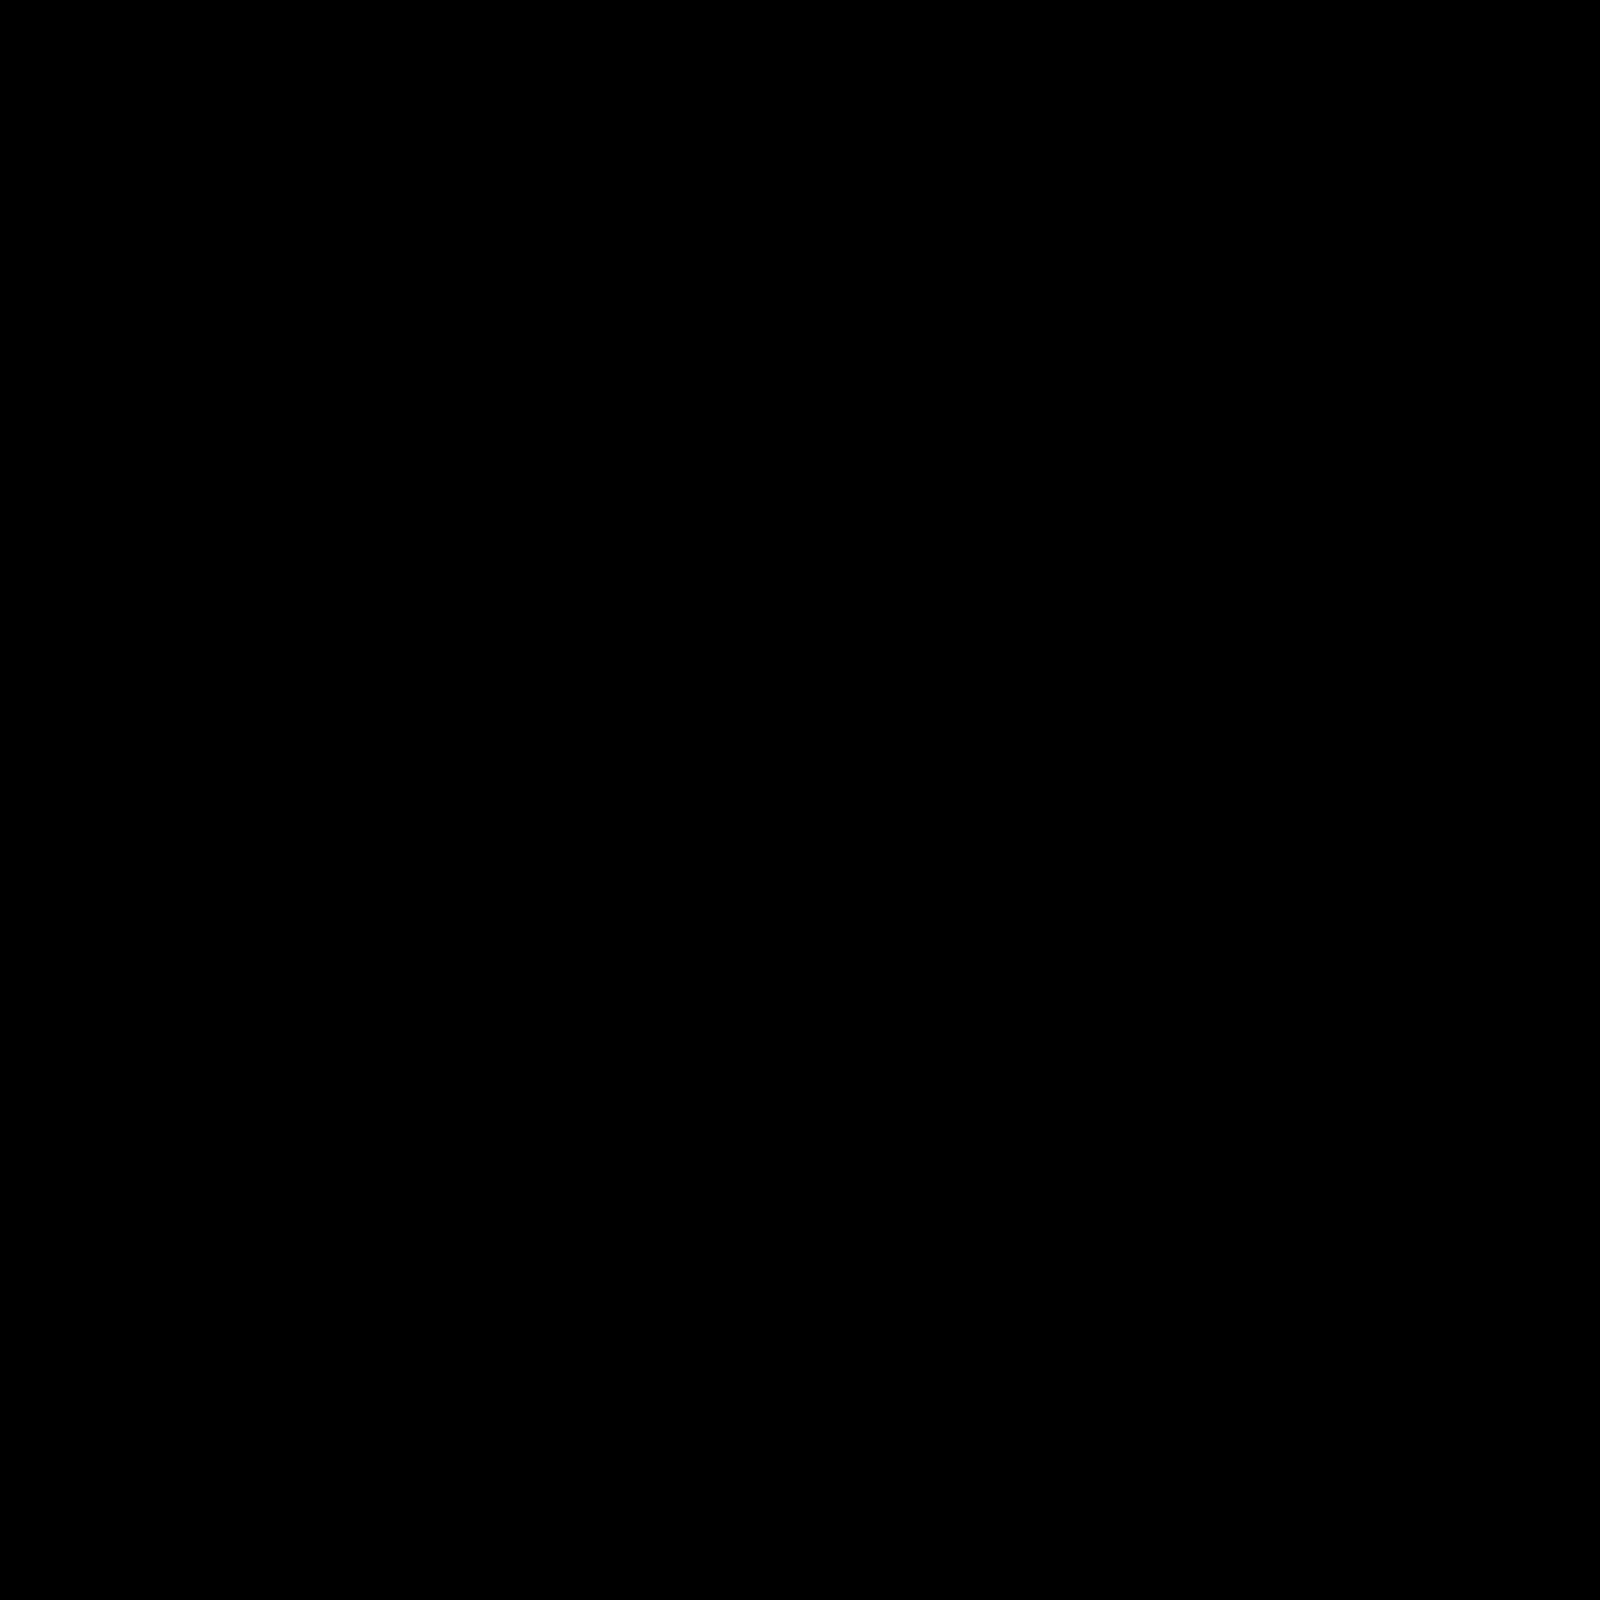 Spotnet Filled icon